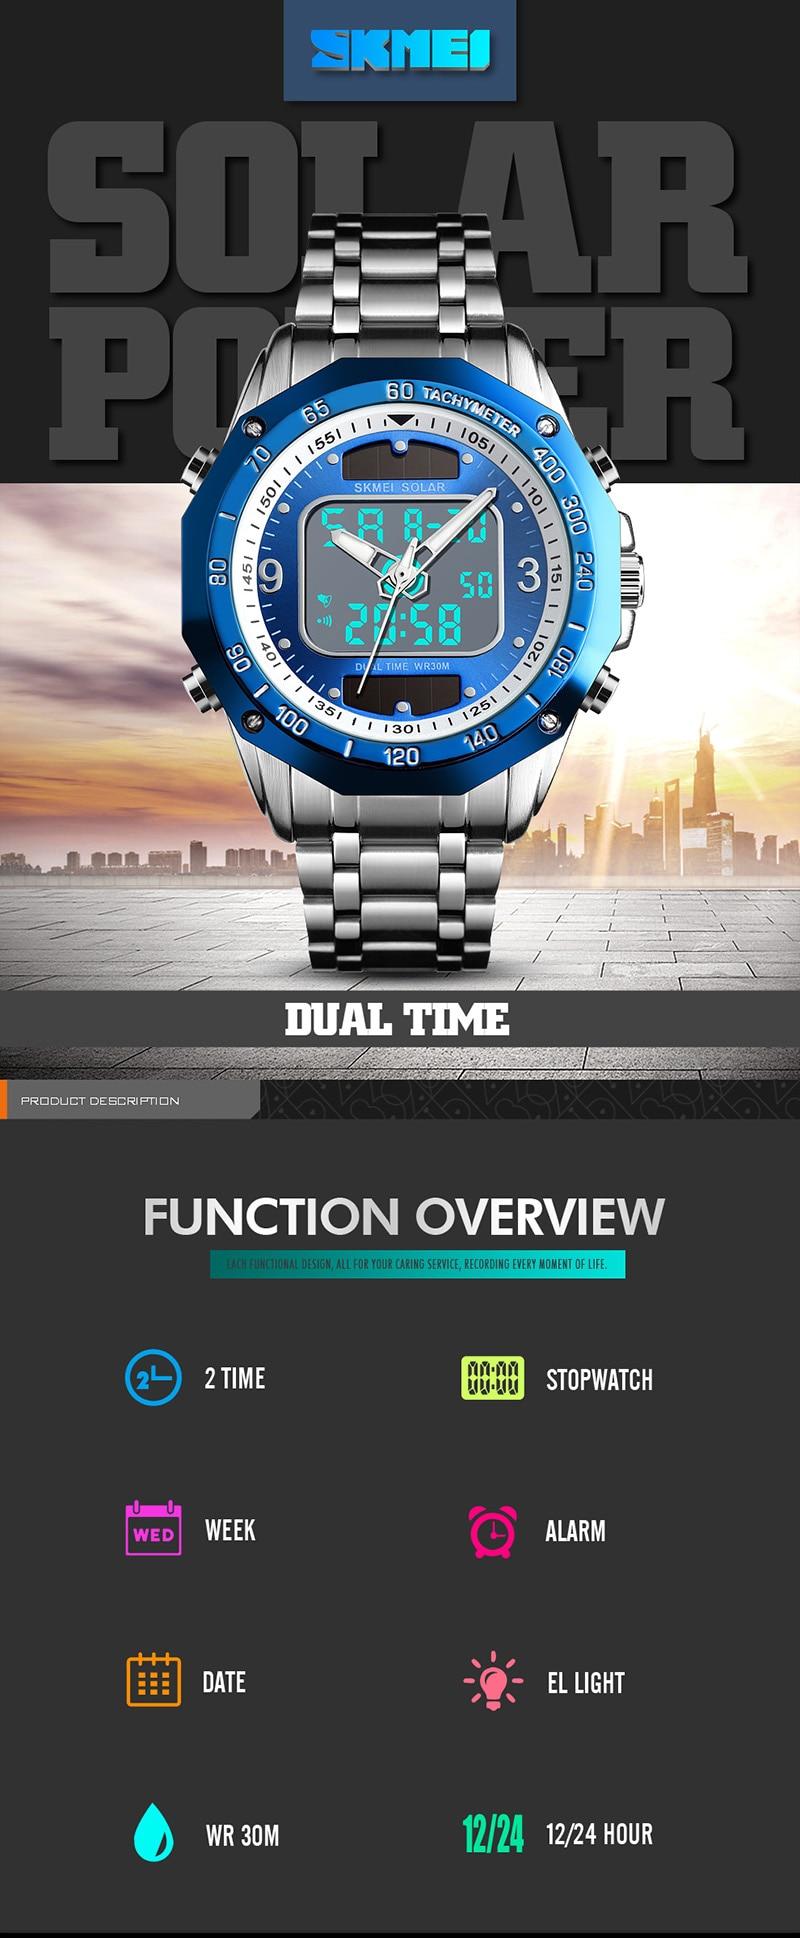 HTB1iJmkUNjaK1RjSZFAq6zdLFXaG Solar Men Military Sport Watches Men's Digital Quartz Clock Full Steel Waterproof Wrist Watch relojes hombre 2019 SKMEI